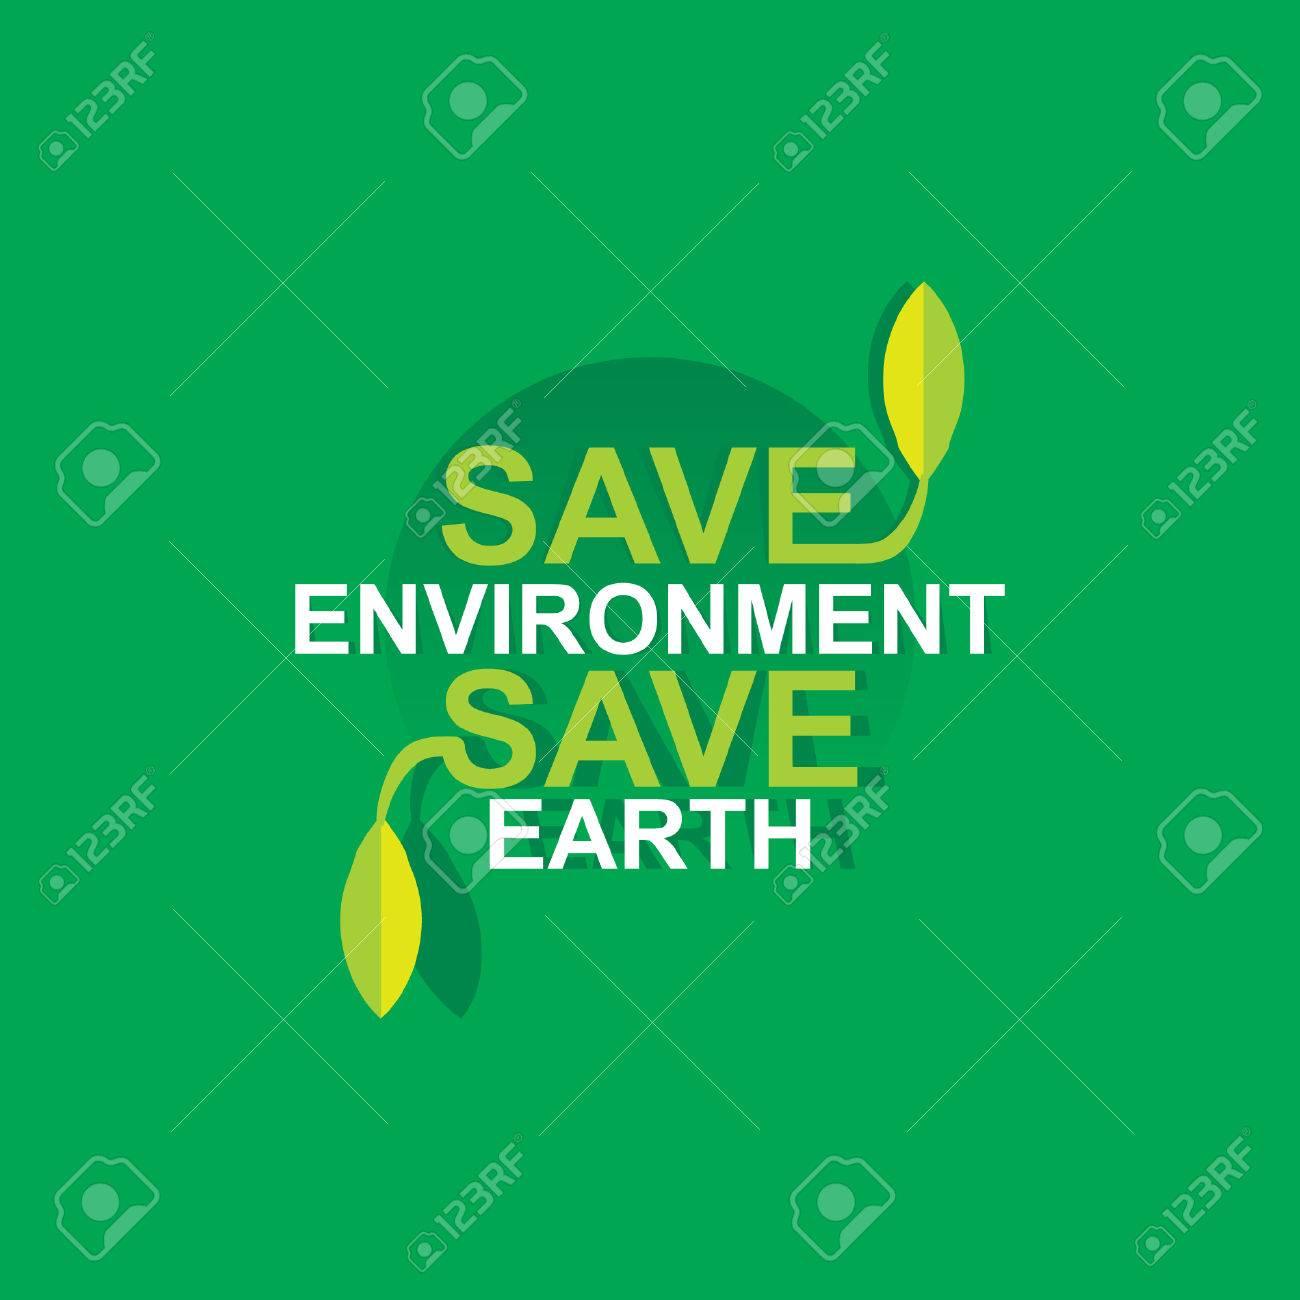 Save Environment Save Earth Concept Royalty Free Cliparts Vectors